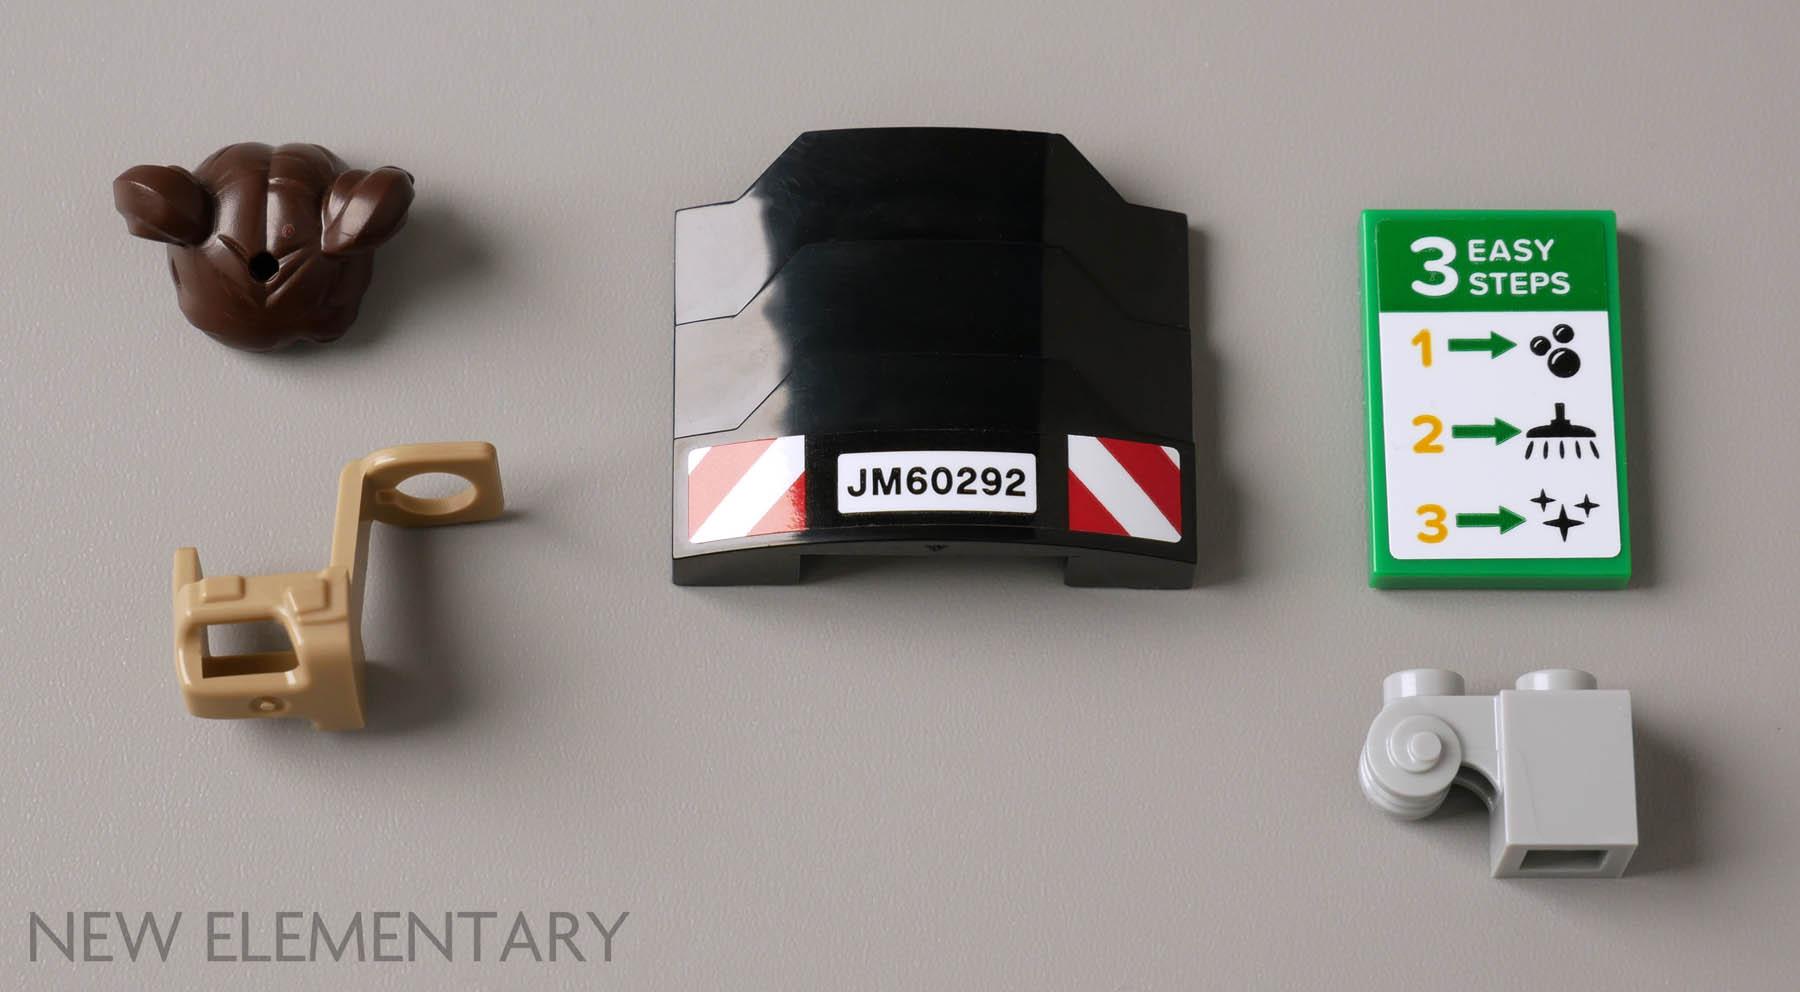 Lego 5 New Medium Azure Tiles Round 2 x 2 with Open Stud Pieces